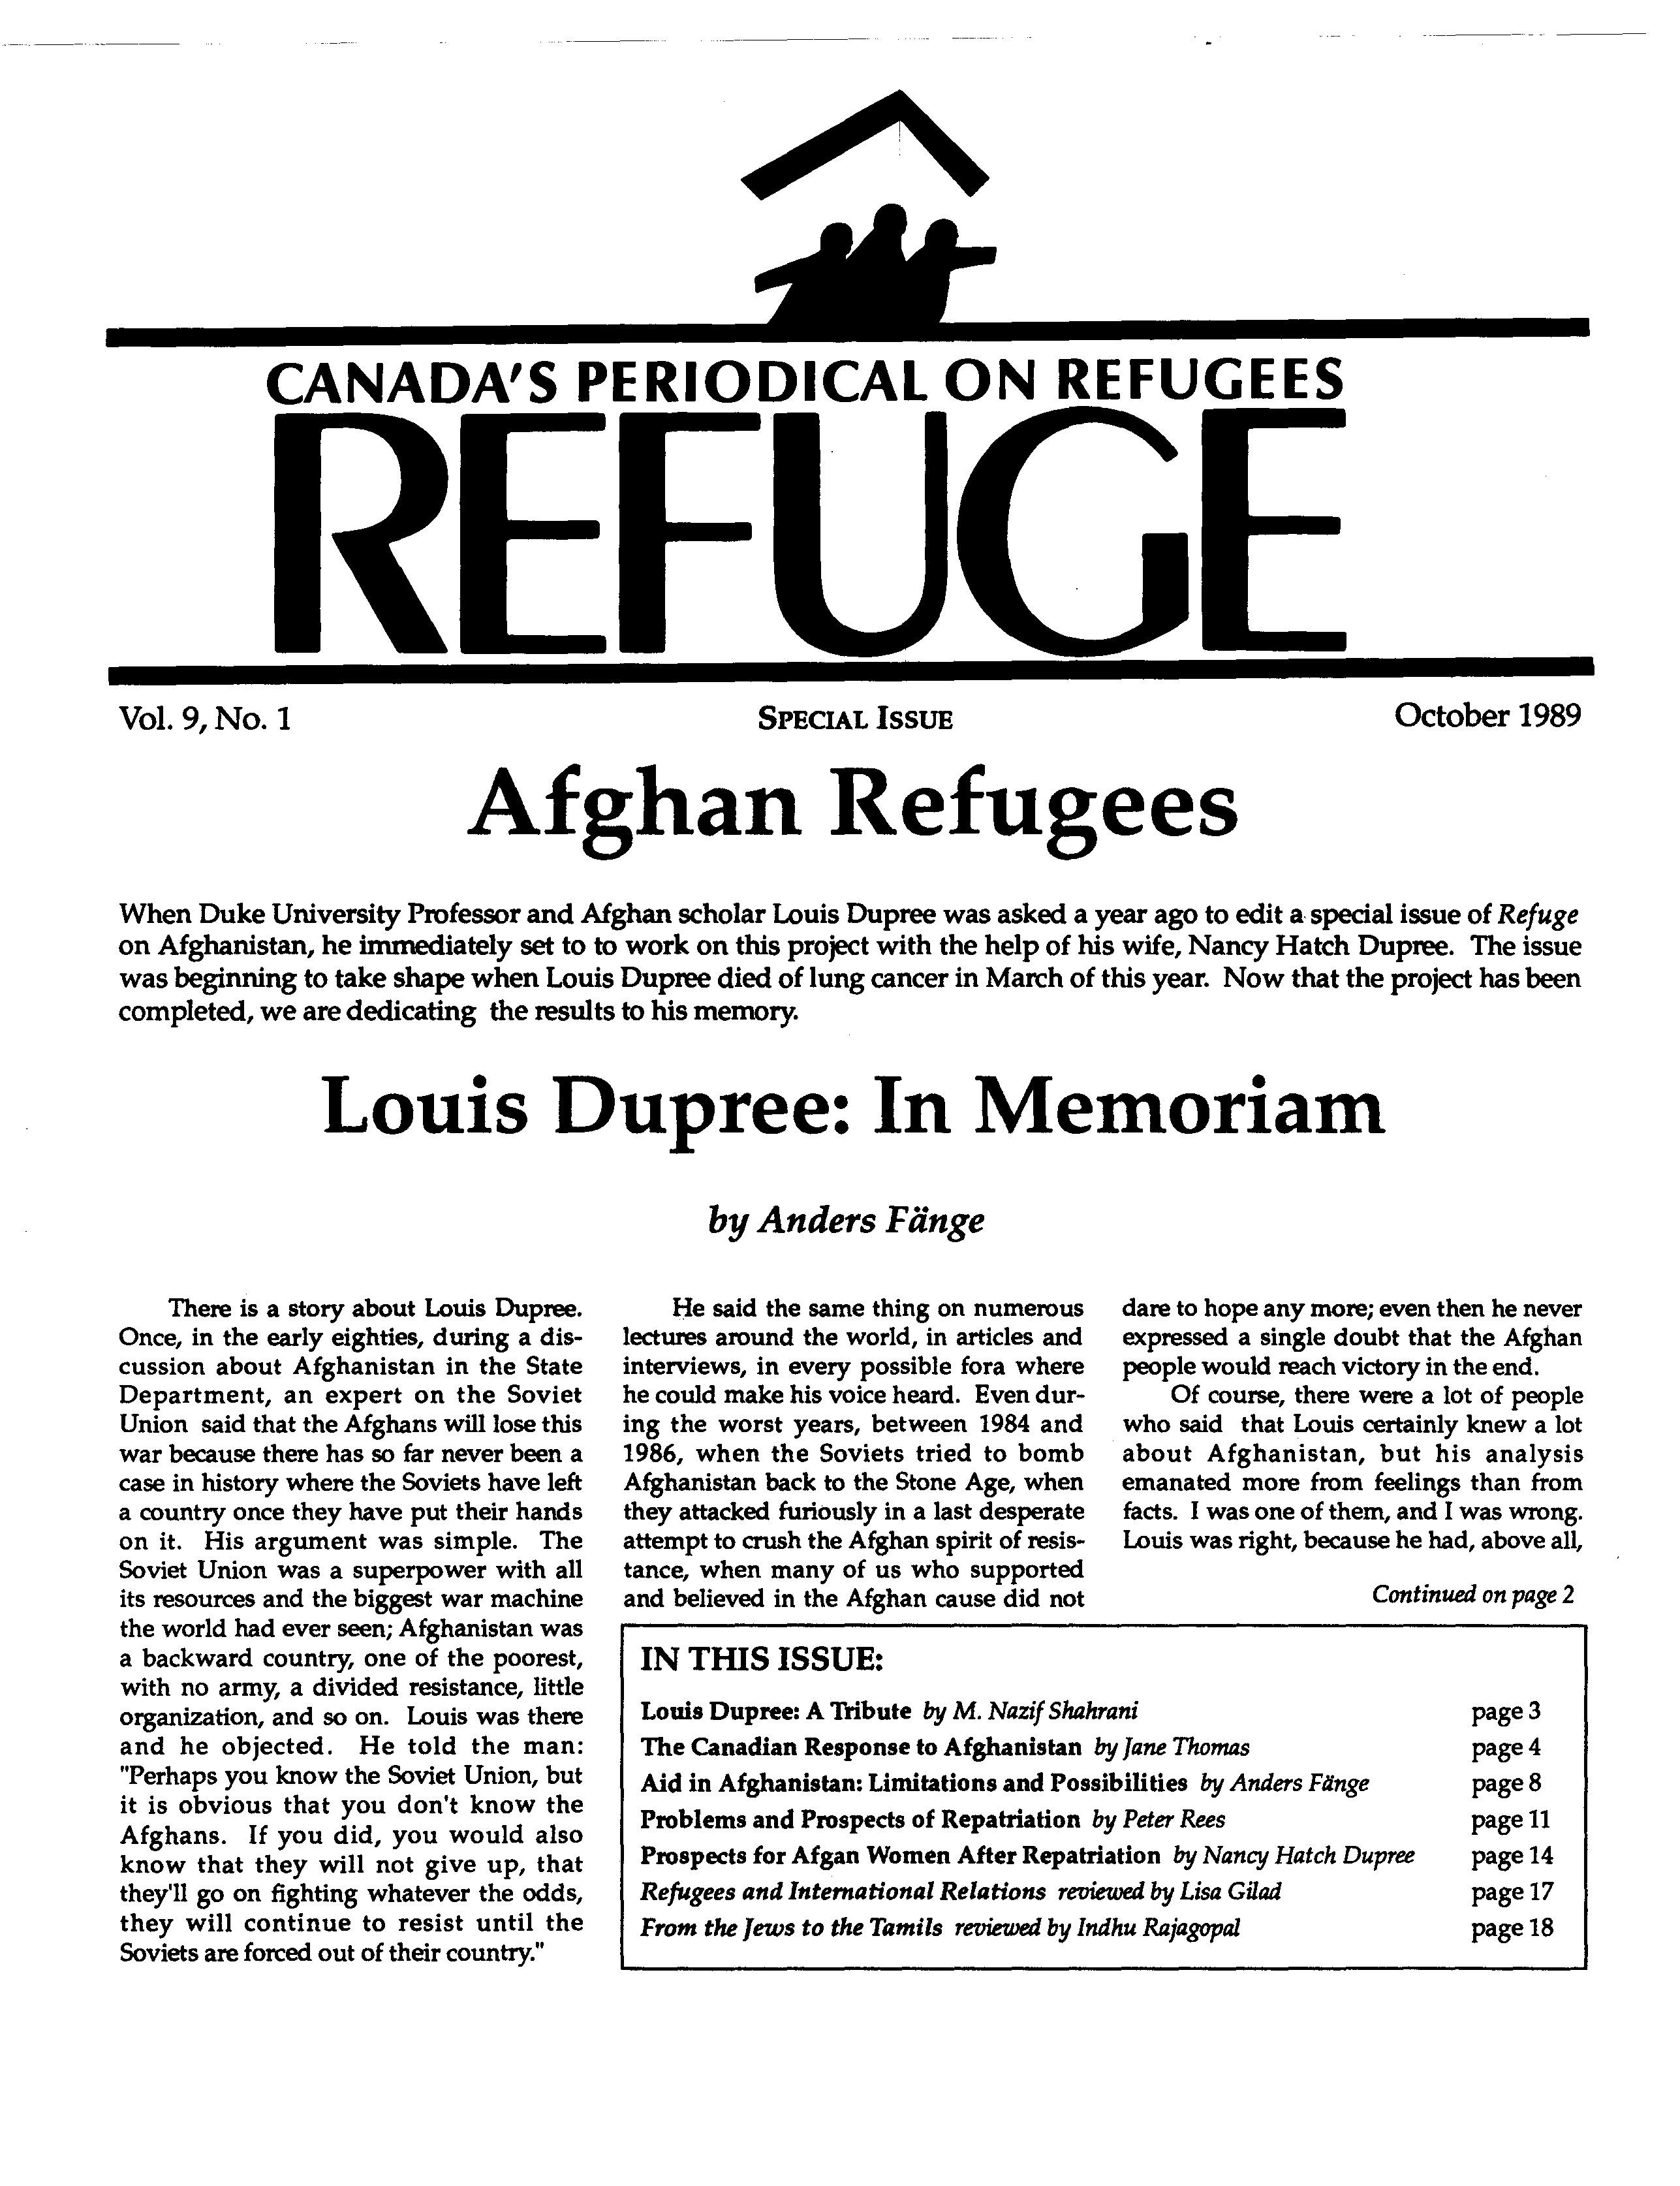 first page Refuge vol. 9.1 1989